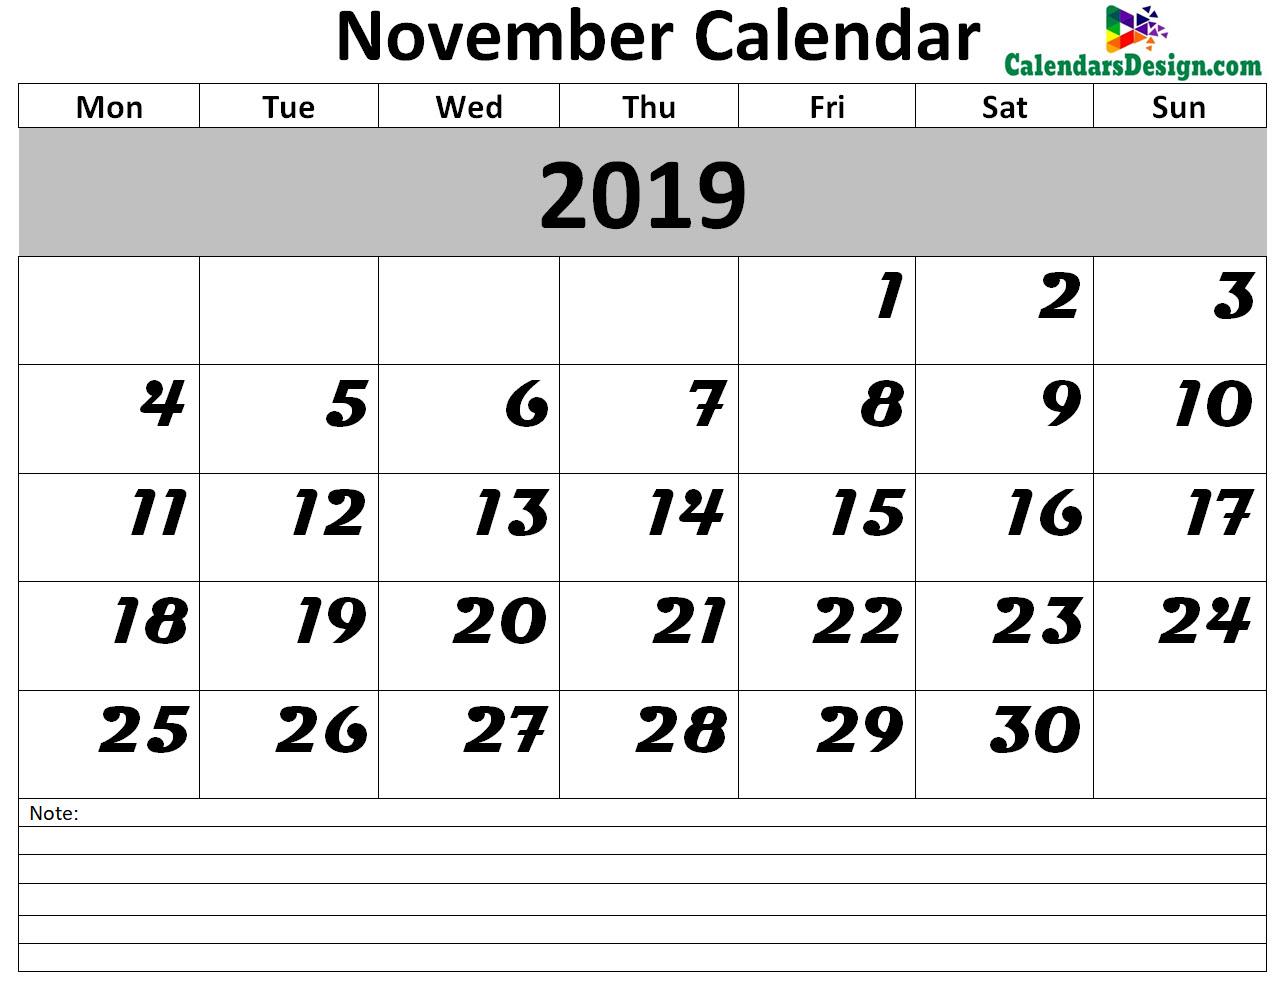 November 2019 Calendar Blank Template